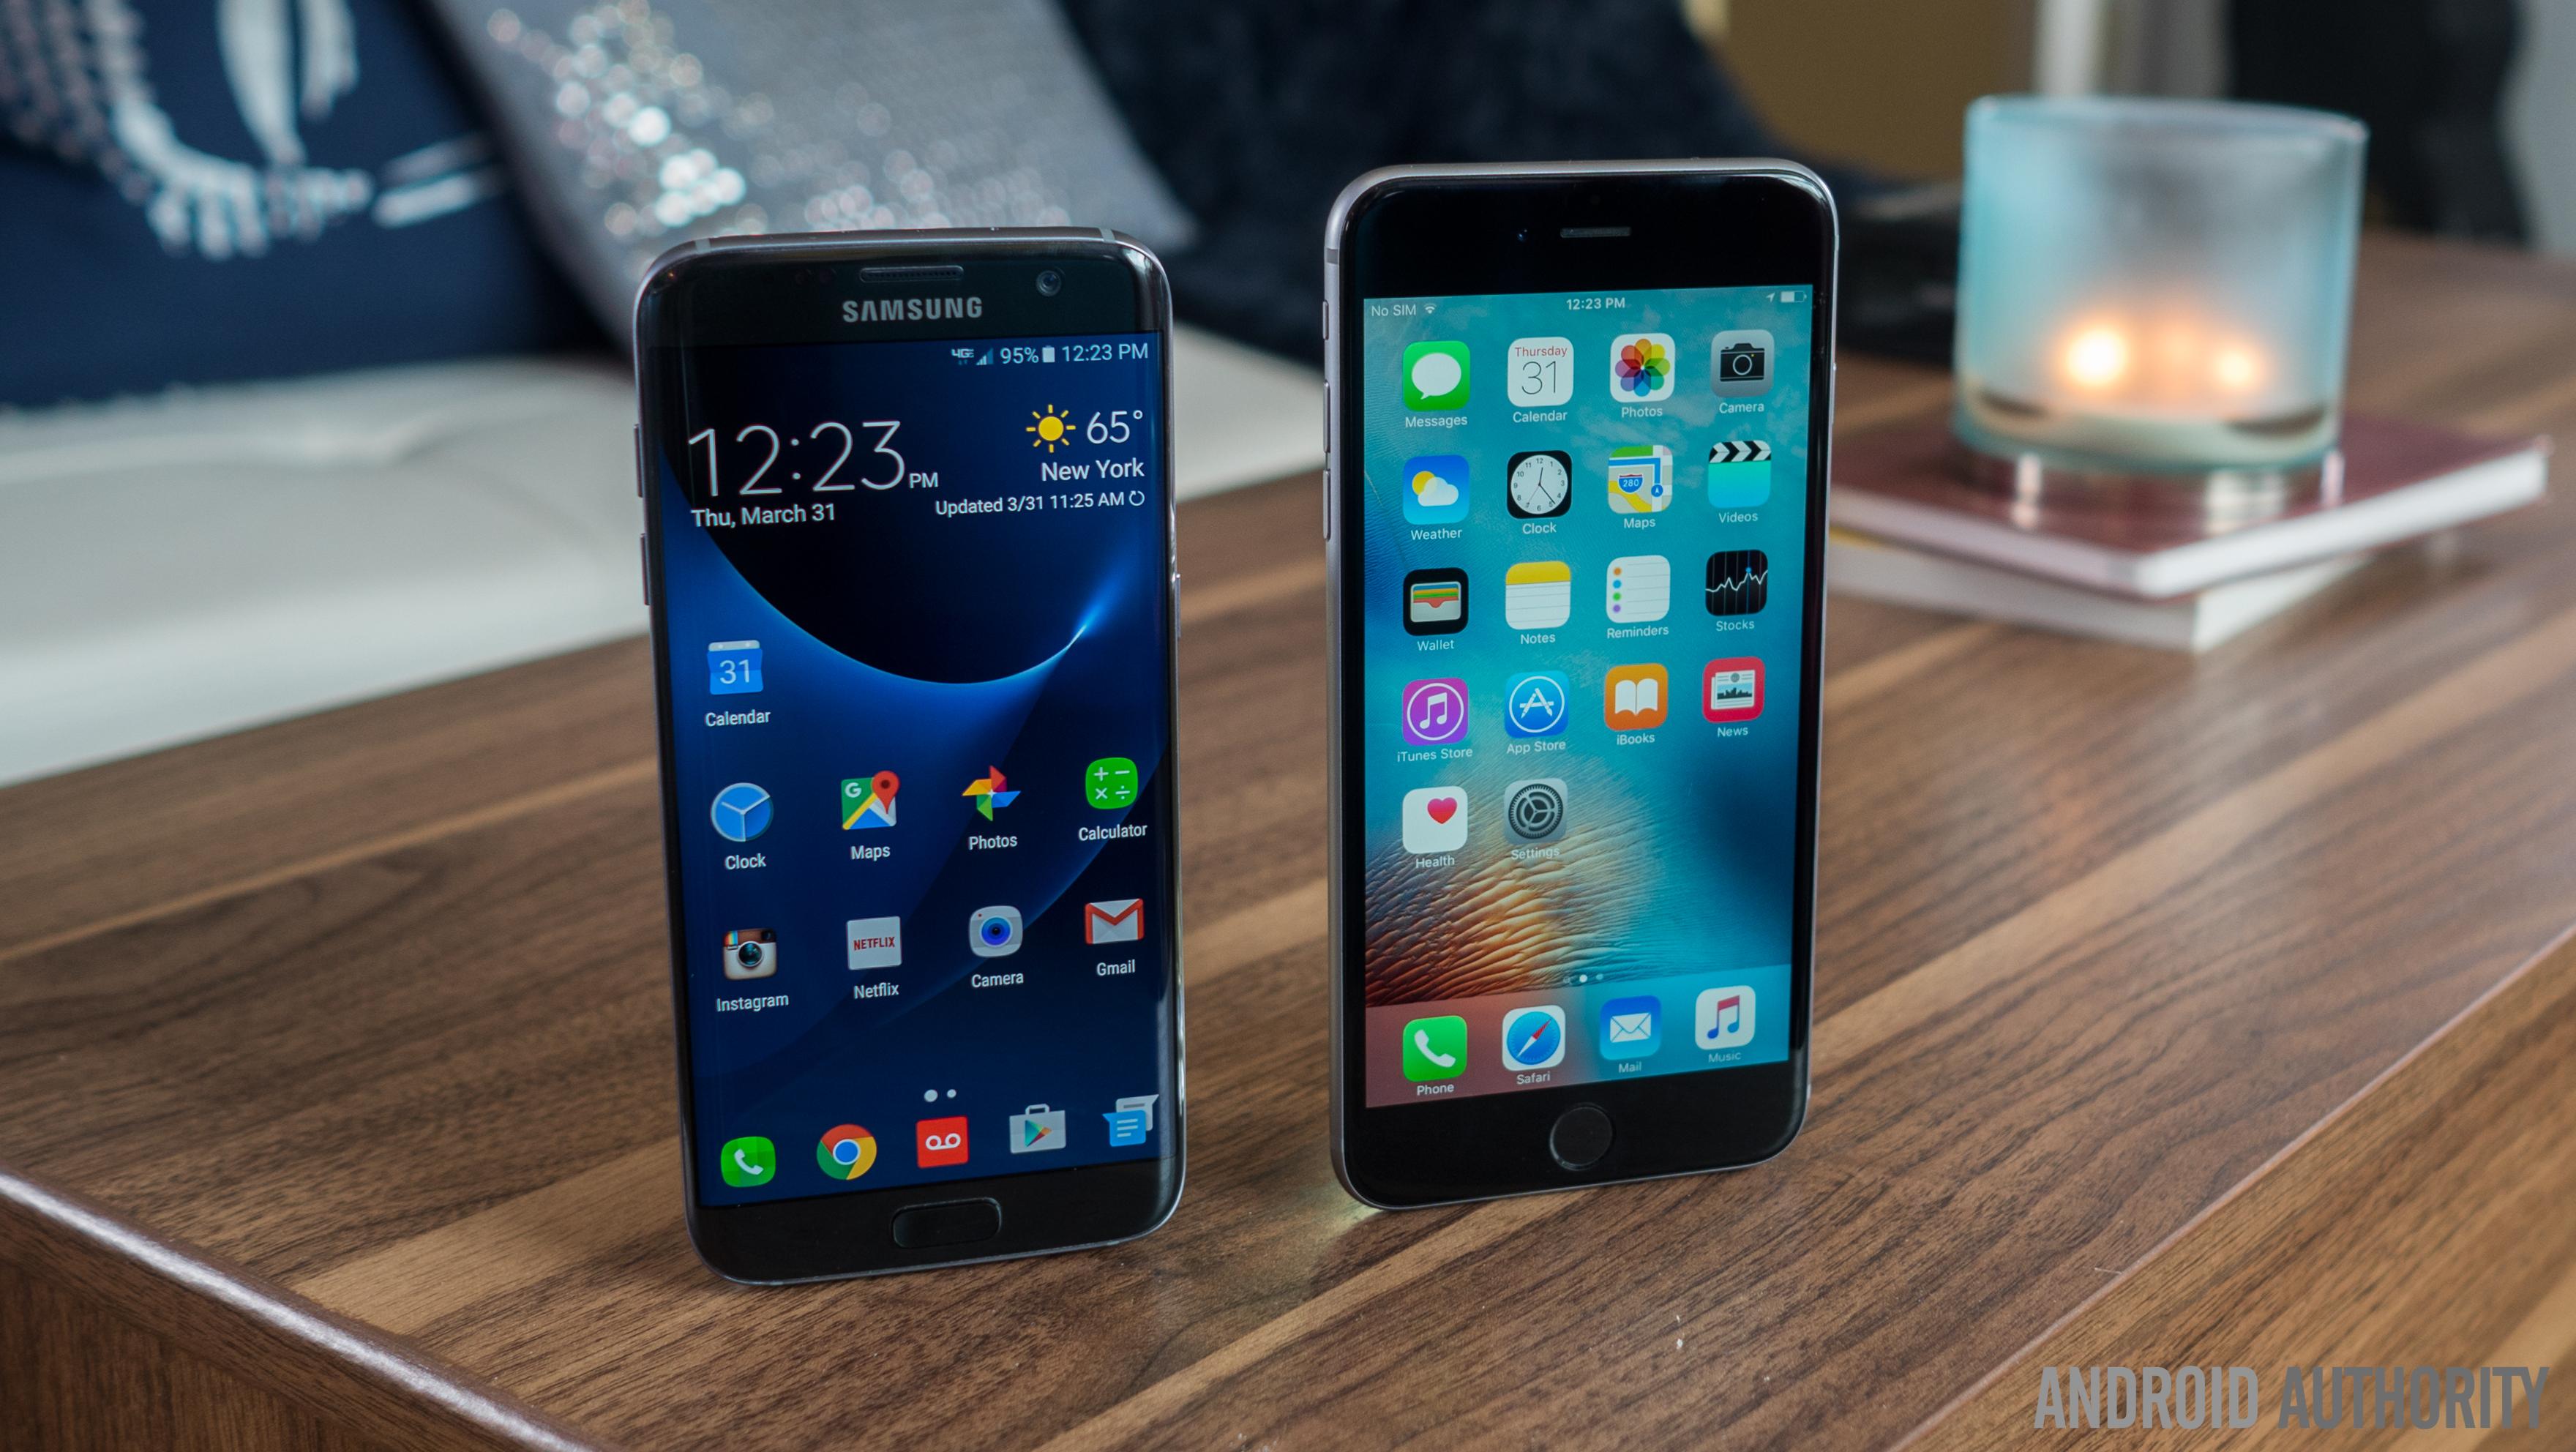 Galaxy-S7-Edge-vs-iPhone-6s-plus-9of18